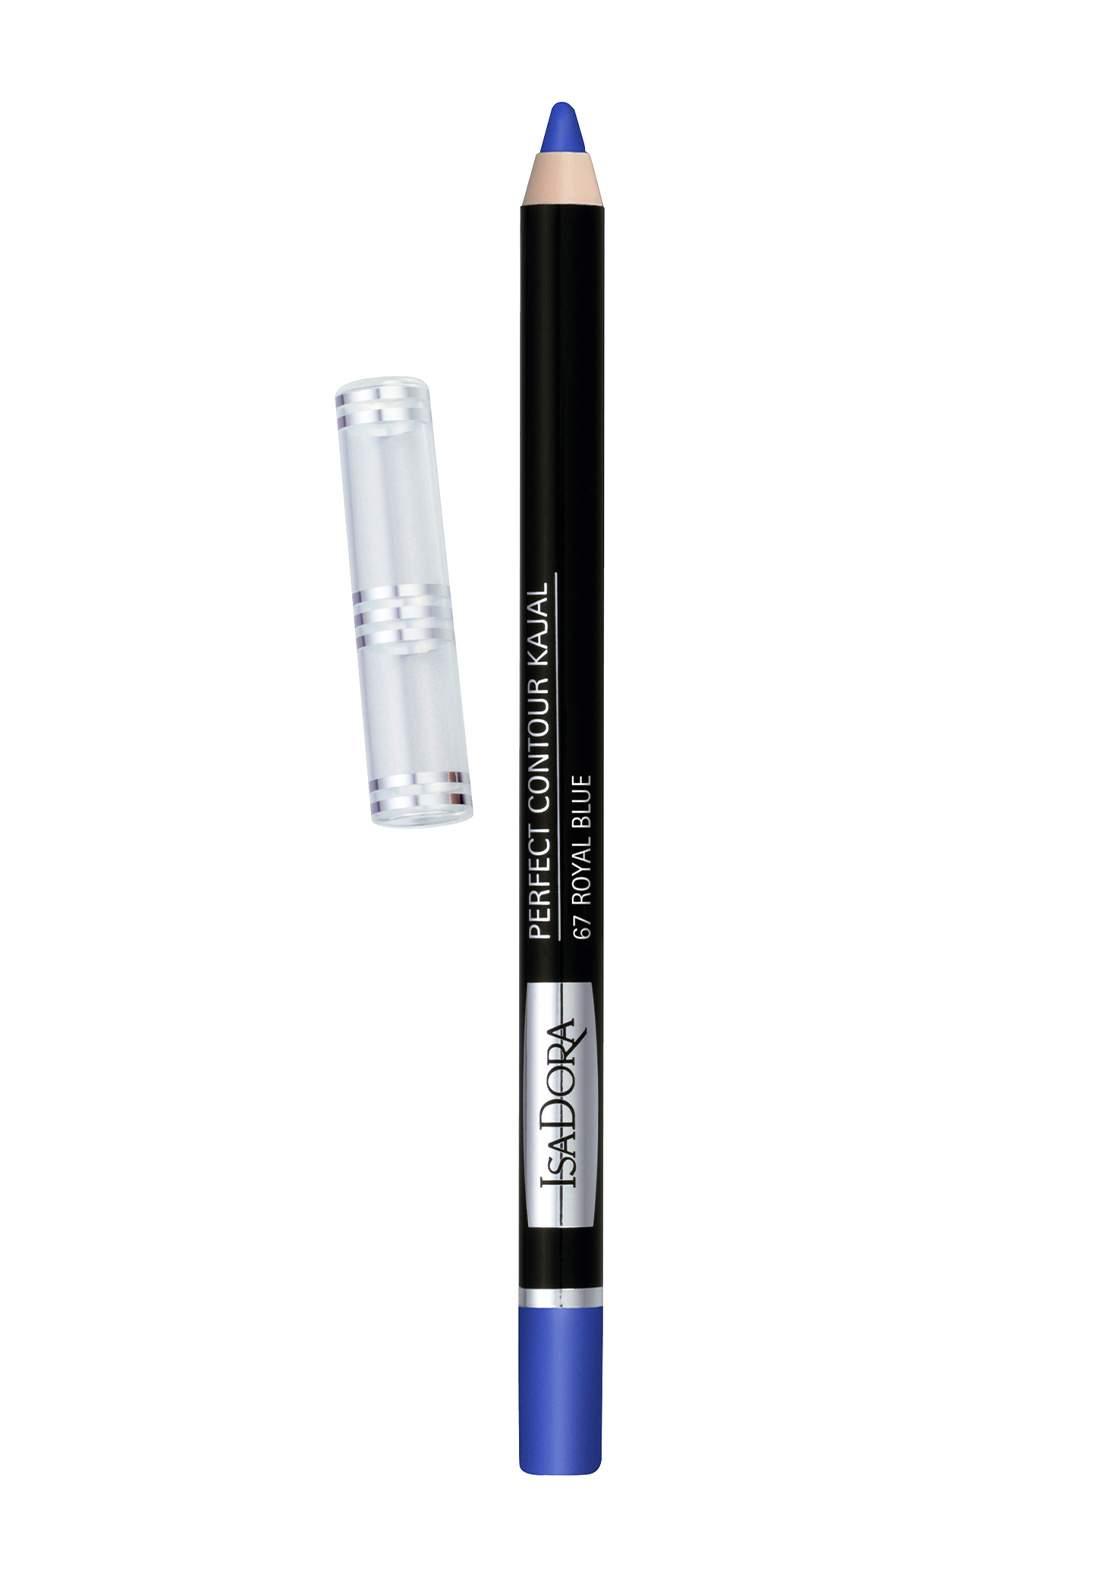 314235 Isadora Perfect Contour Kajal No.67 Royal Blue 1.30g   محدد العيون